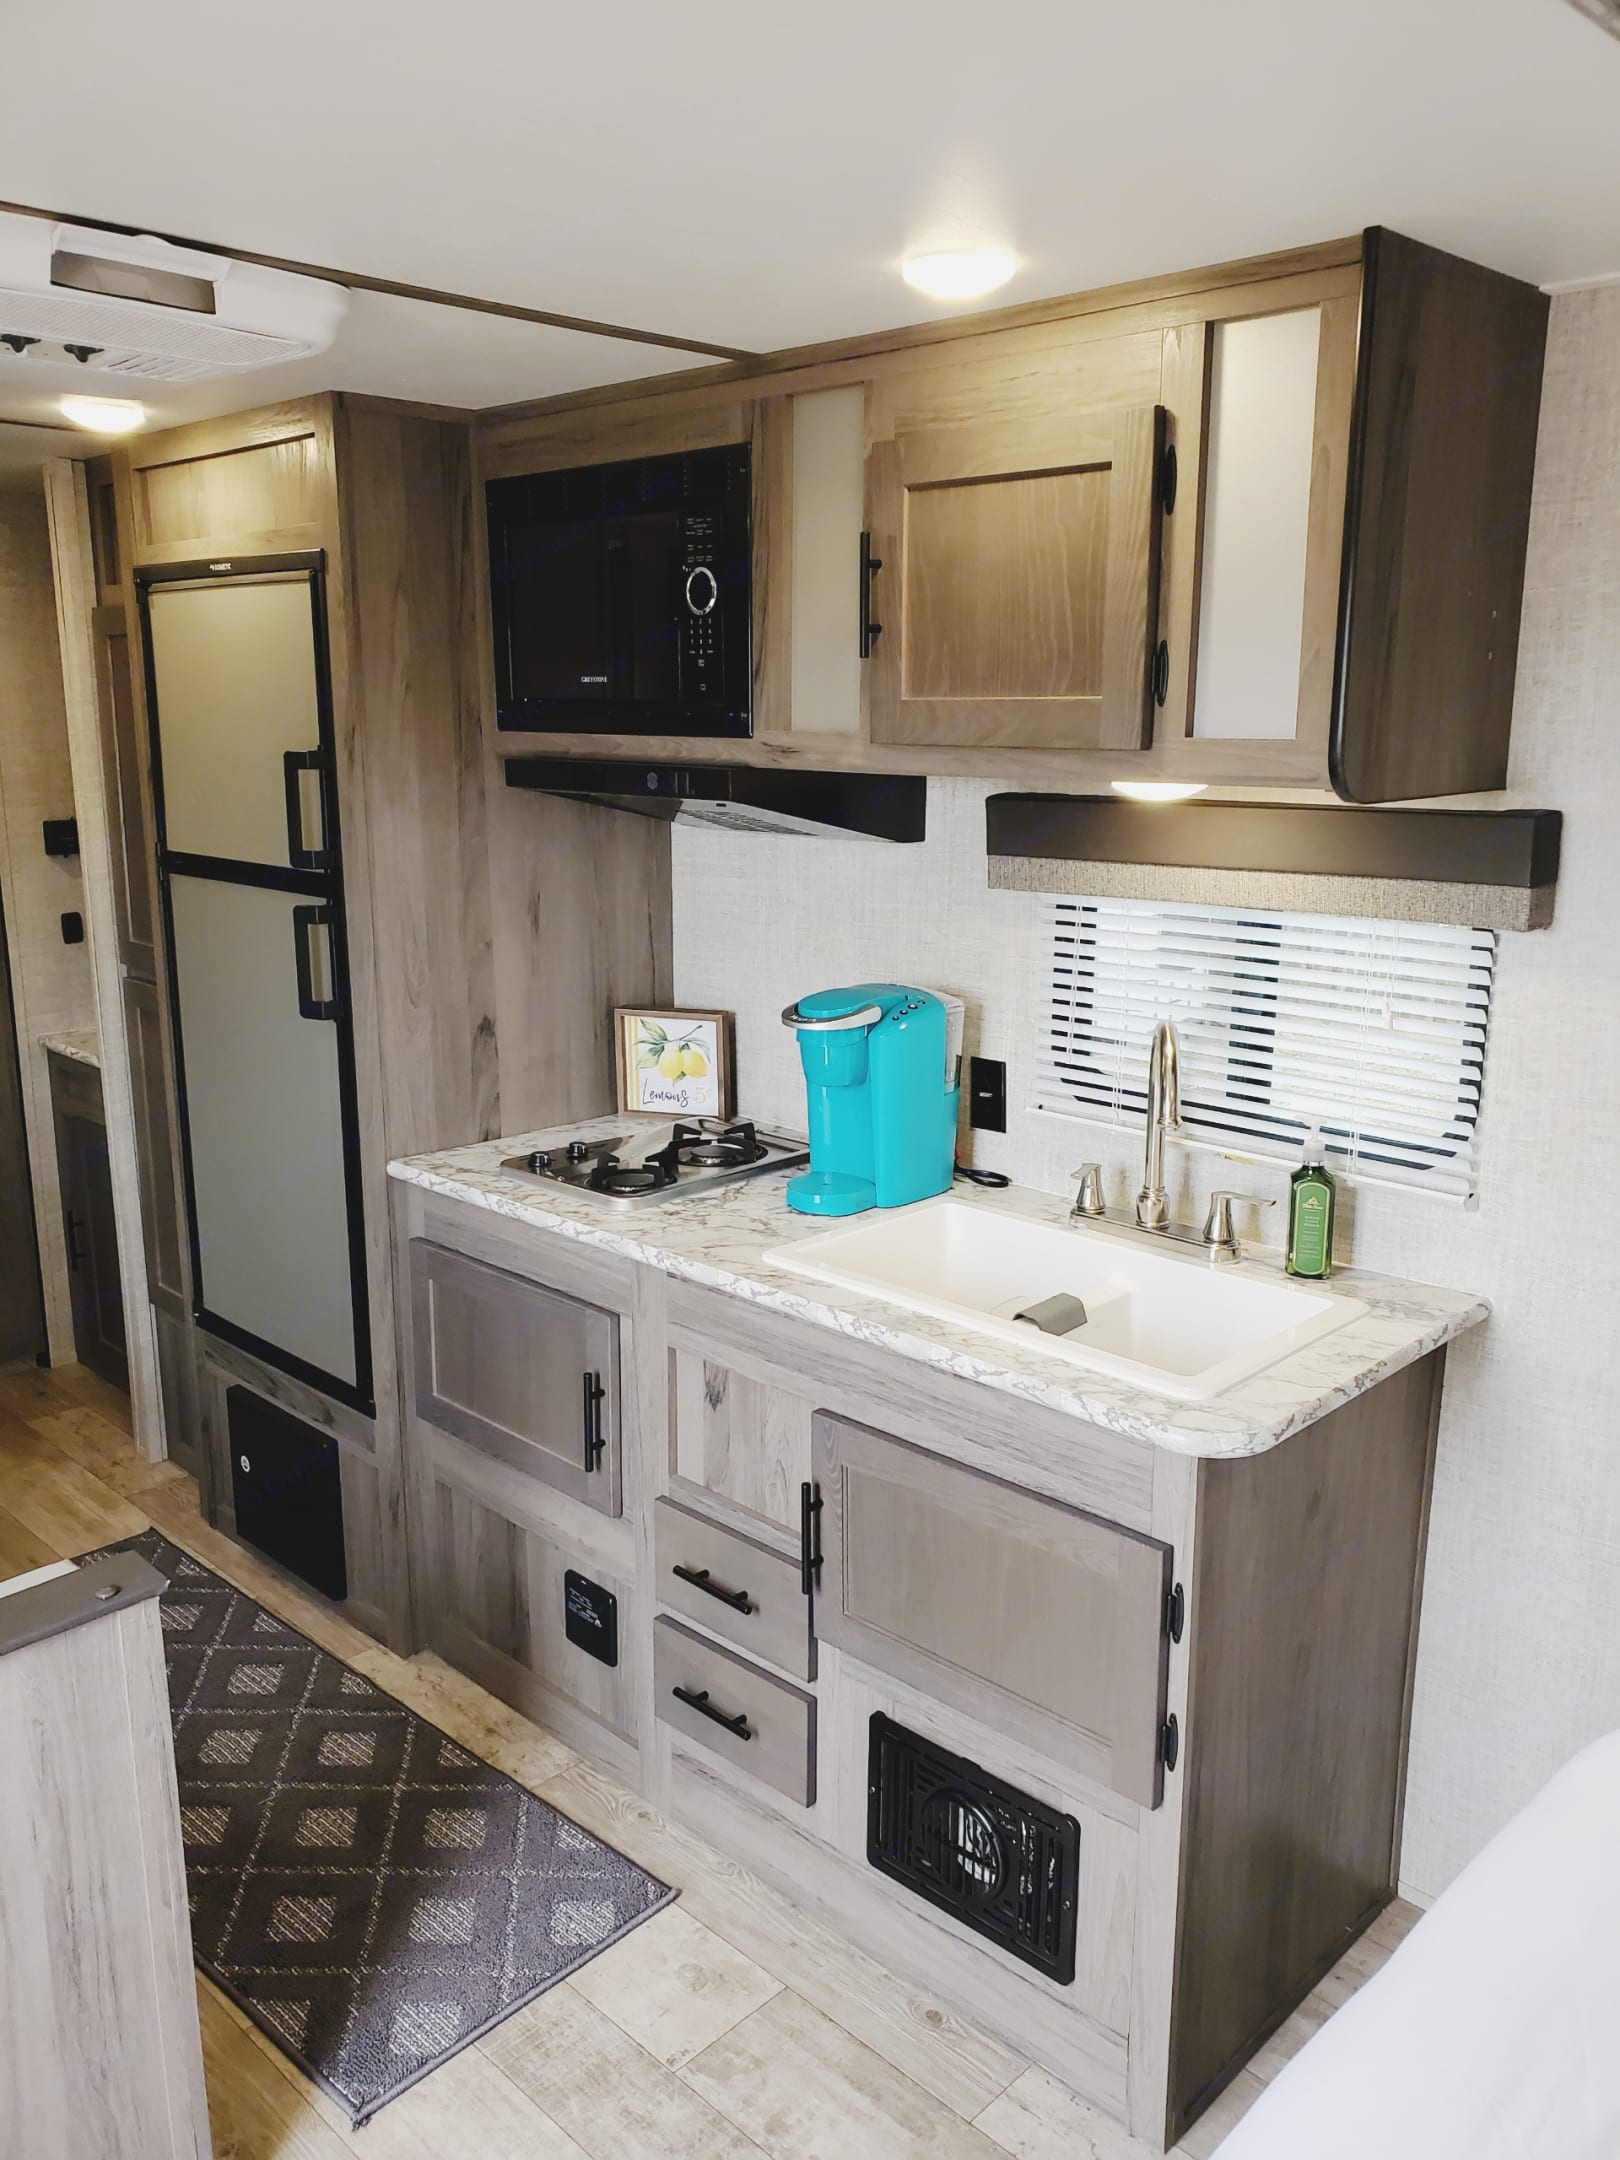 Kitchen equipped w/ a Keurig machine. Gulf Stream Kingsport 2021